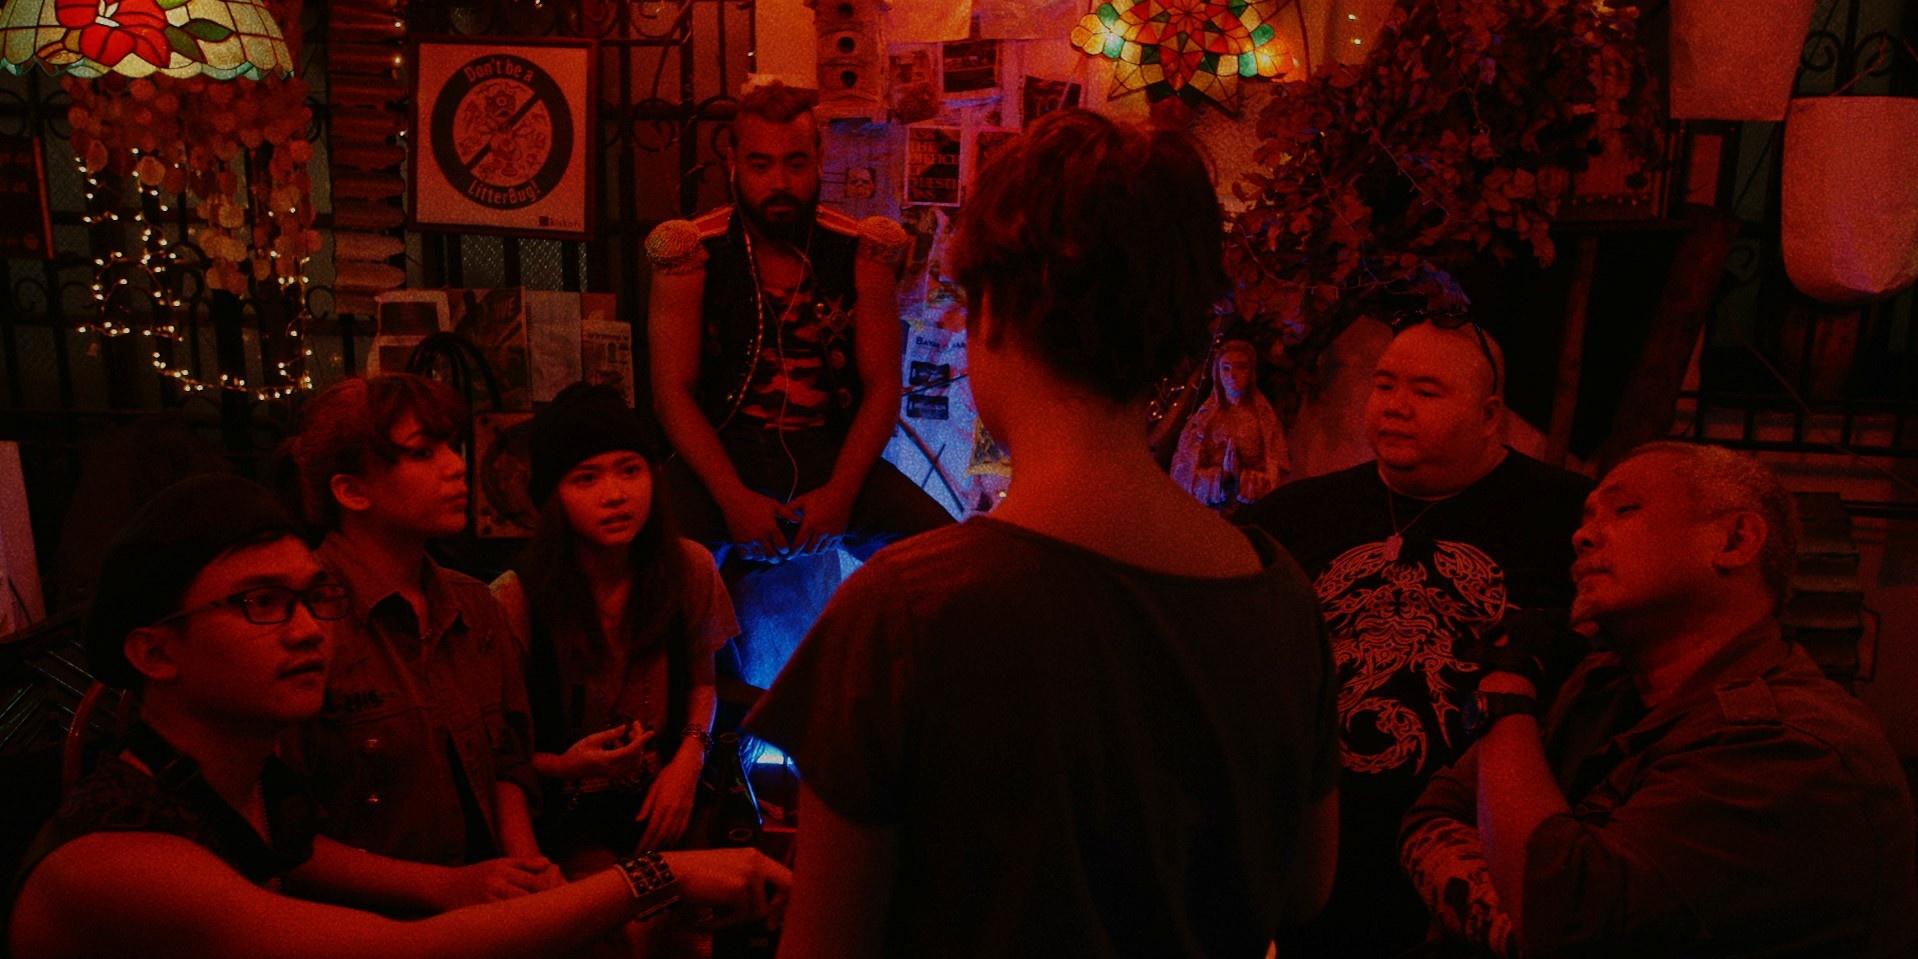 Flying Ipis featured in Vimeo Staff Pick short film Manila Death Squad